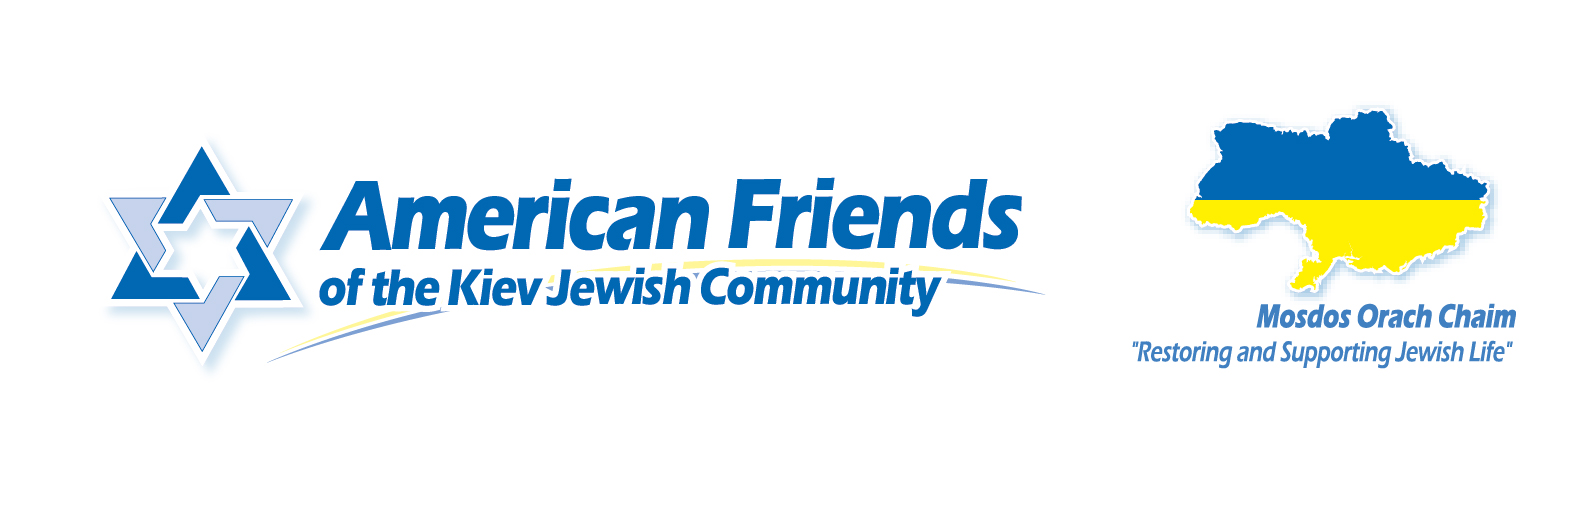 AmericanFriends-Logo.jpg